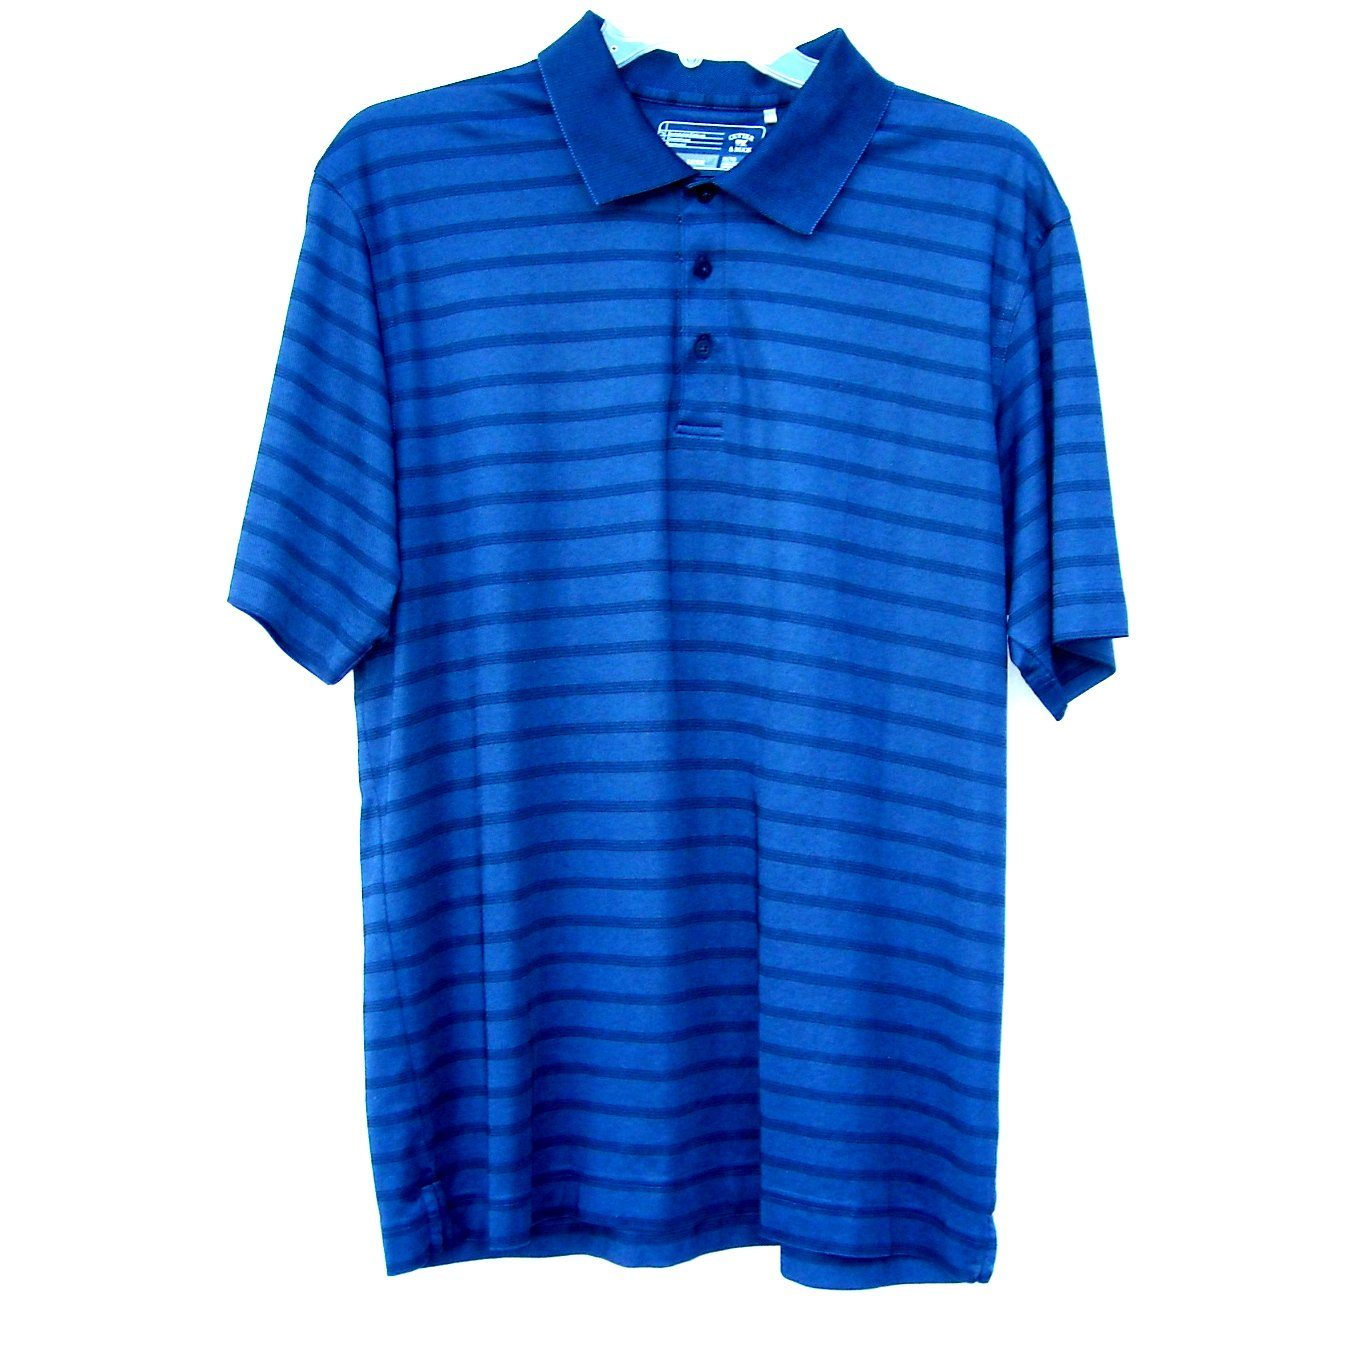 Cutter & Buck CB Dry Tec Blue Golf Polo Shirt Size XL